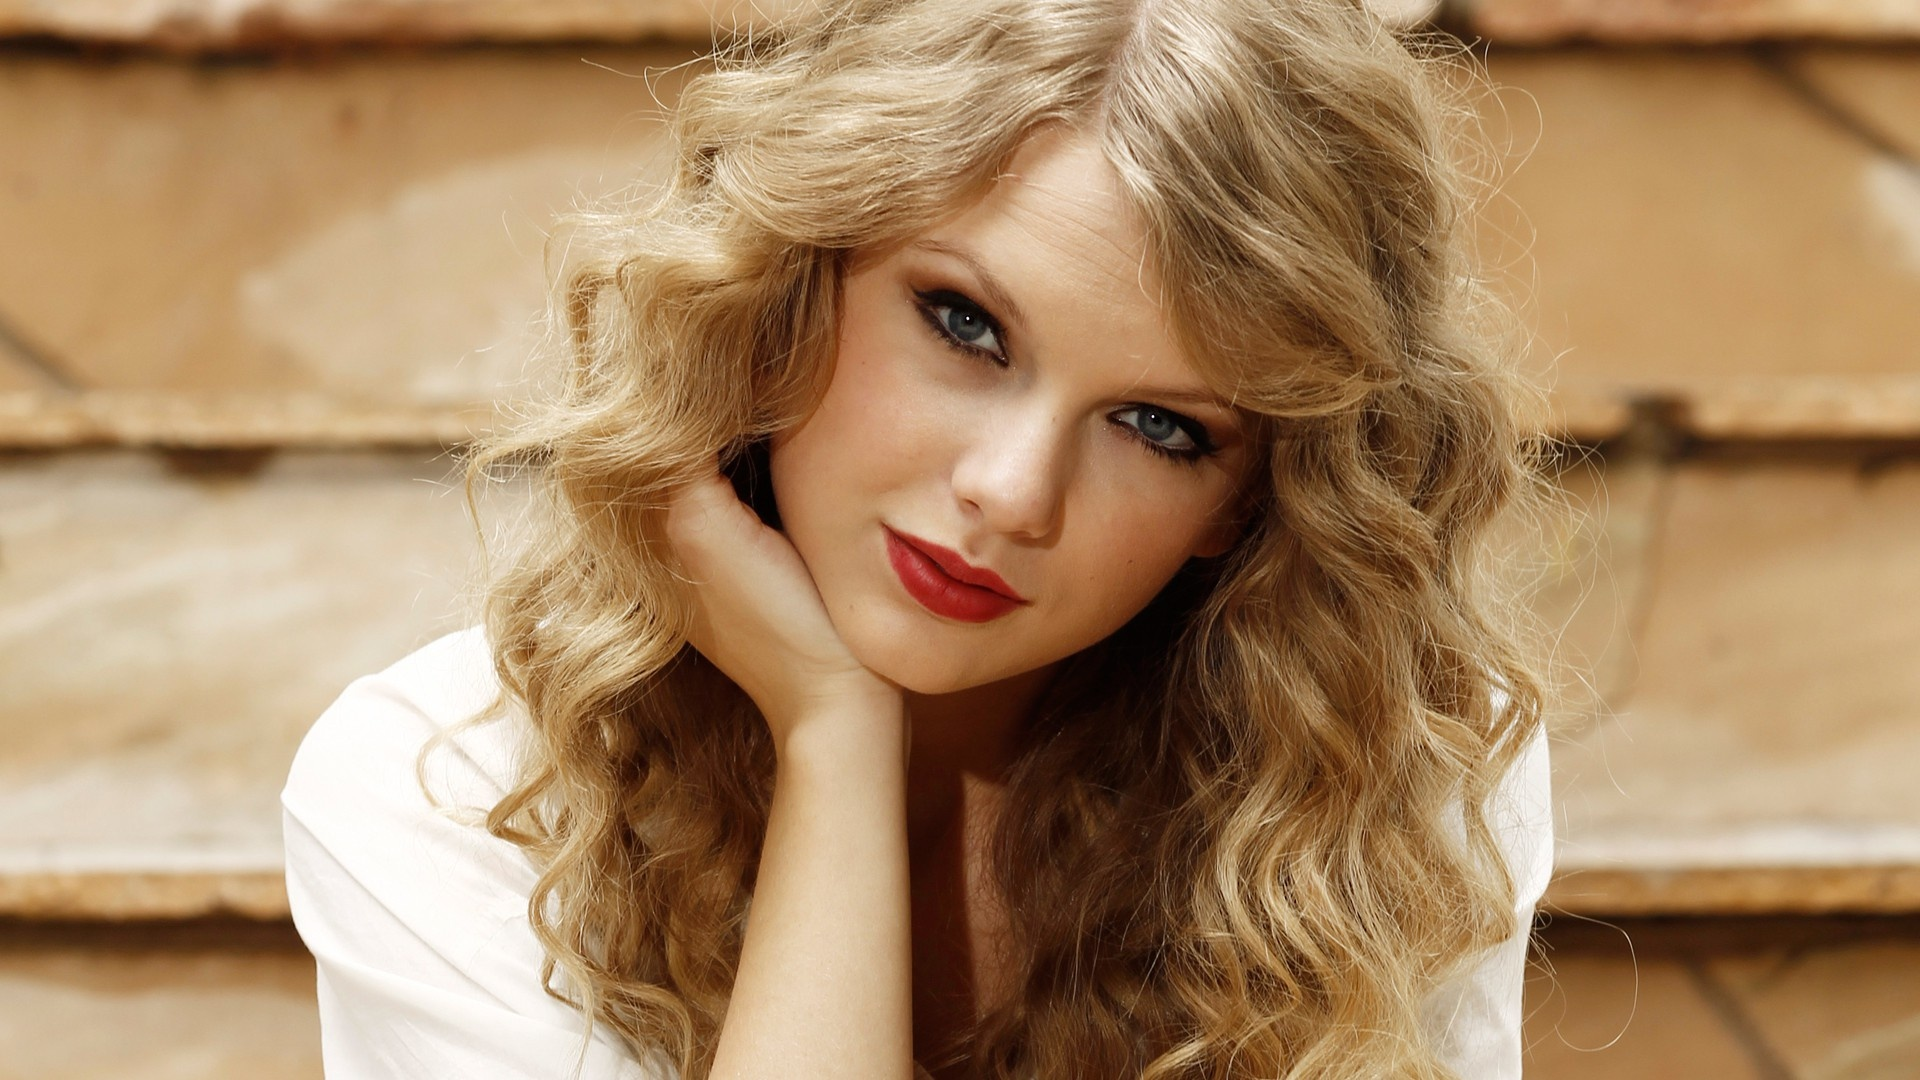 Taylor Swift Hair Style HD Wallpaper Celebrities Wallpapers 1920x1080